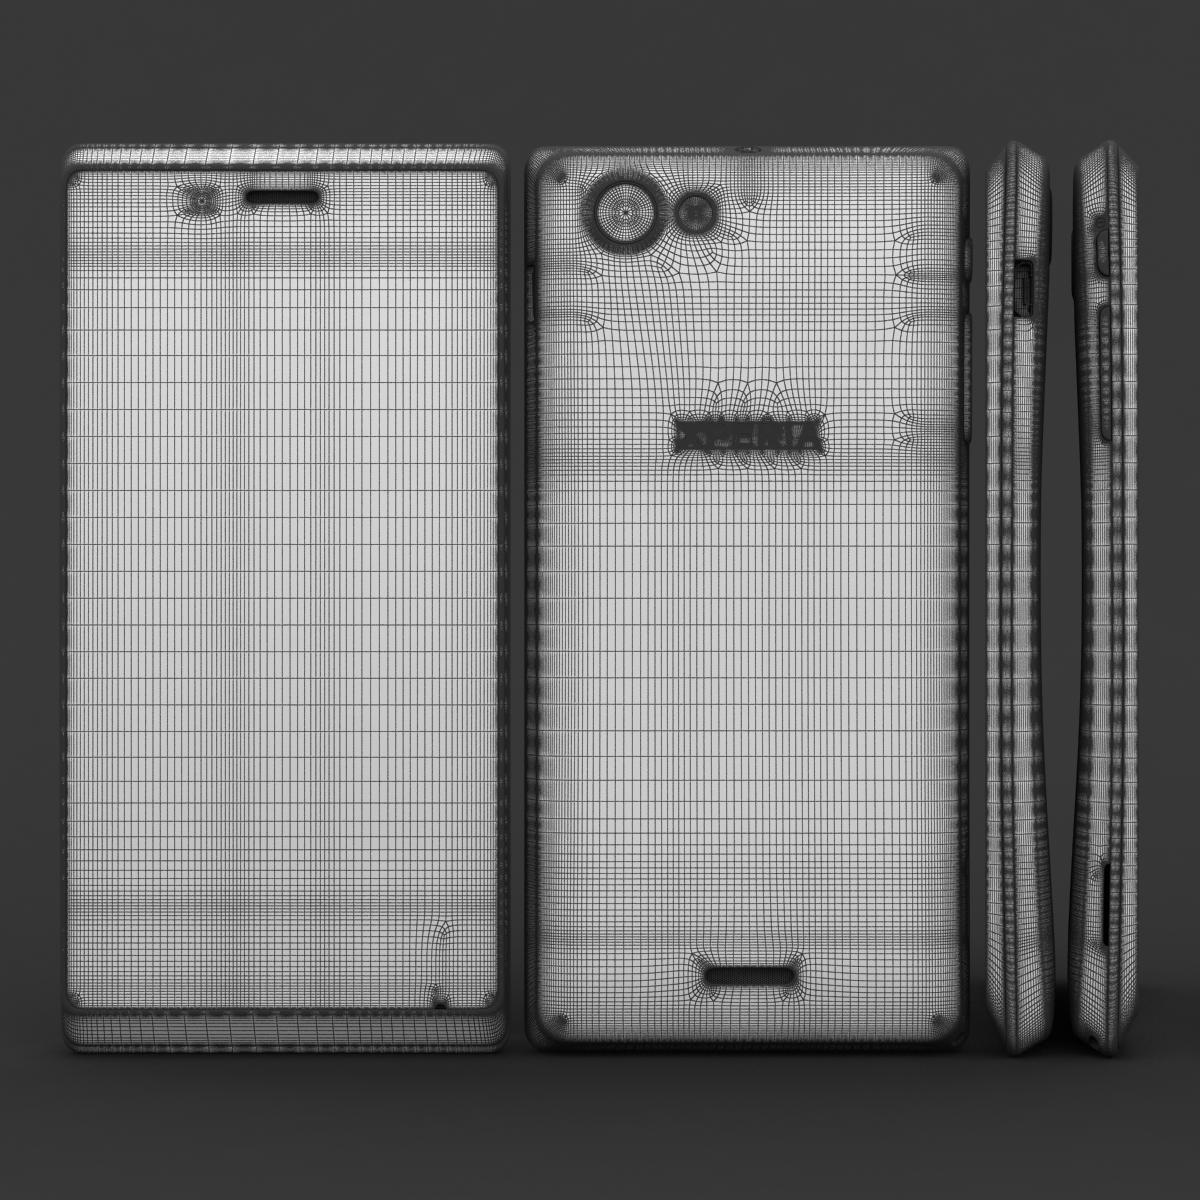 sony xperia j 3d модел 3ds макс fbx c4d lwo obj 151169